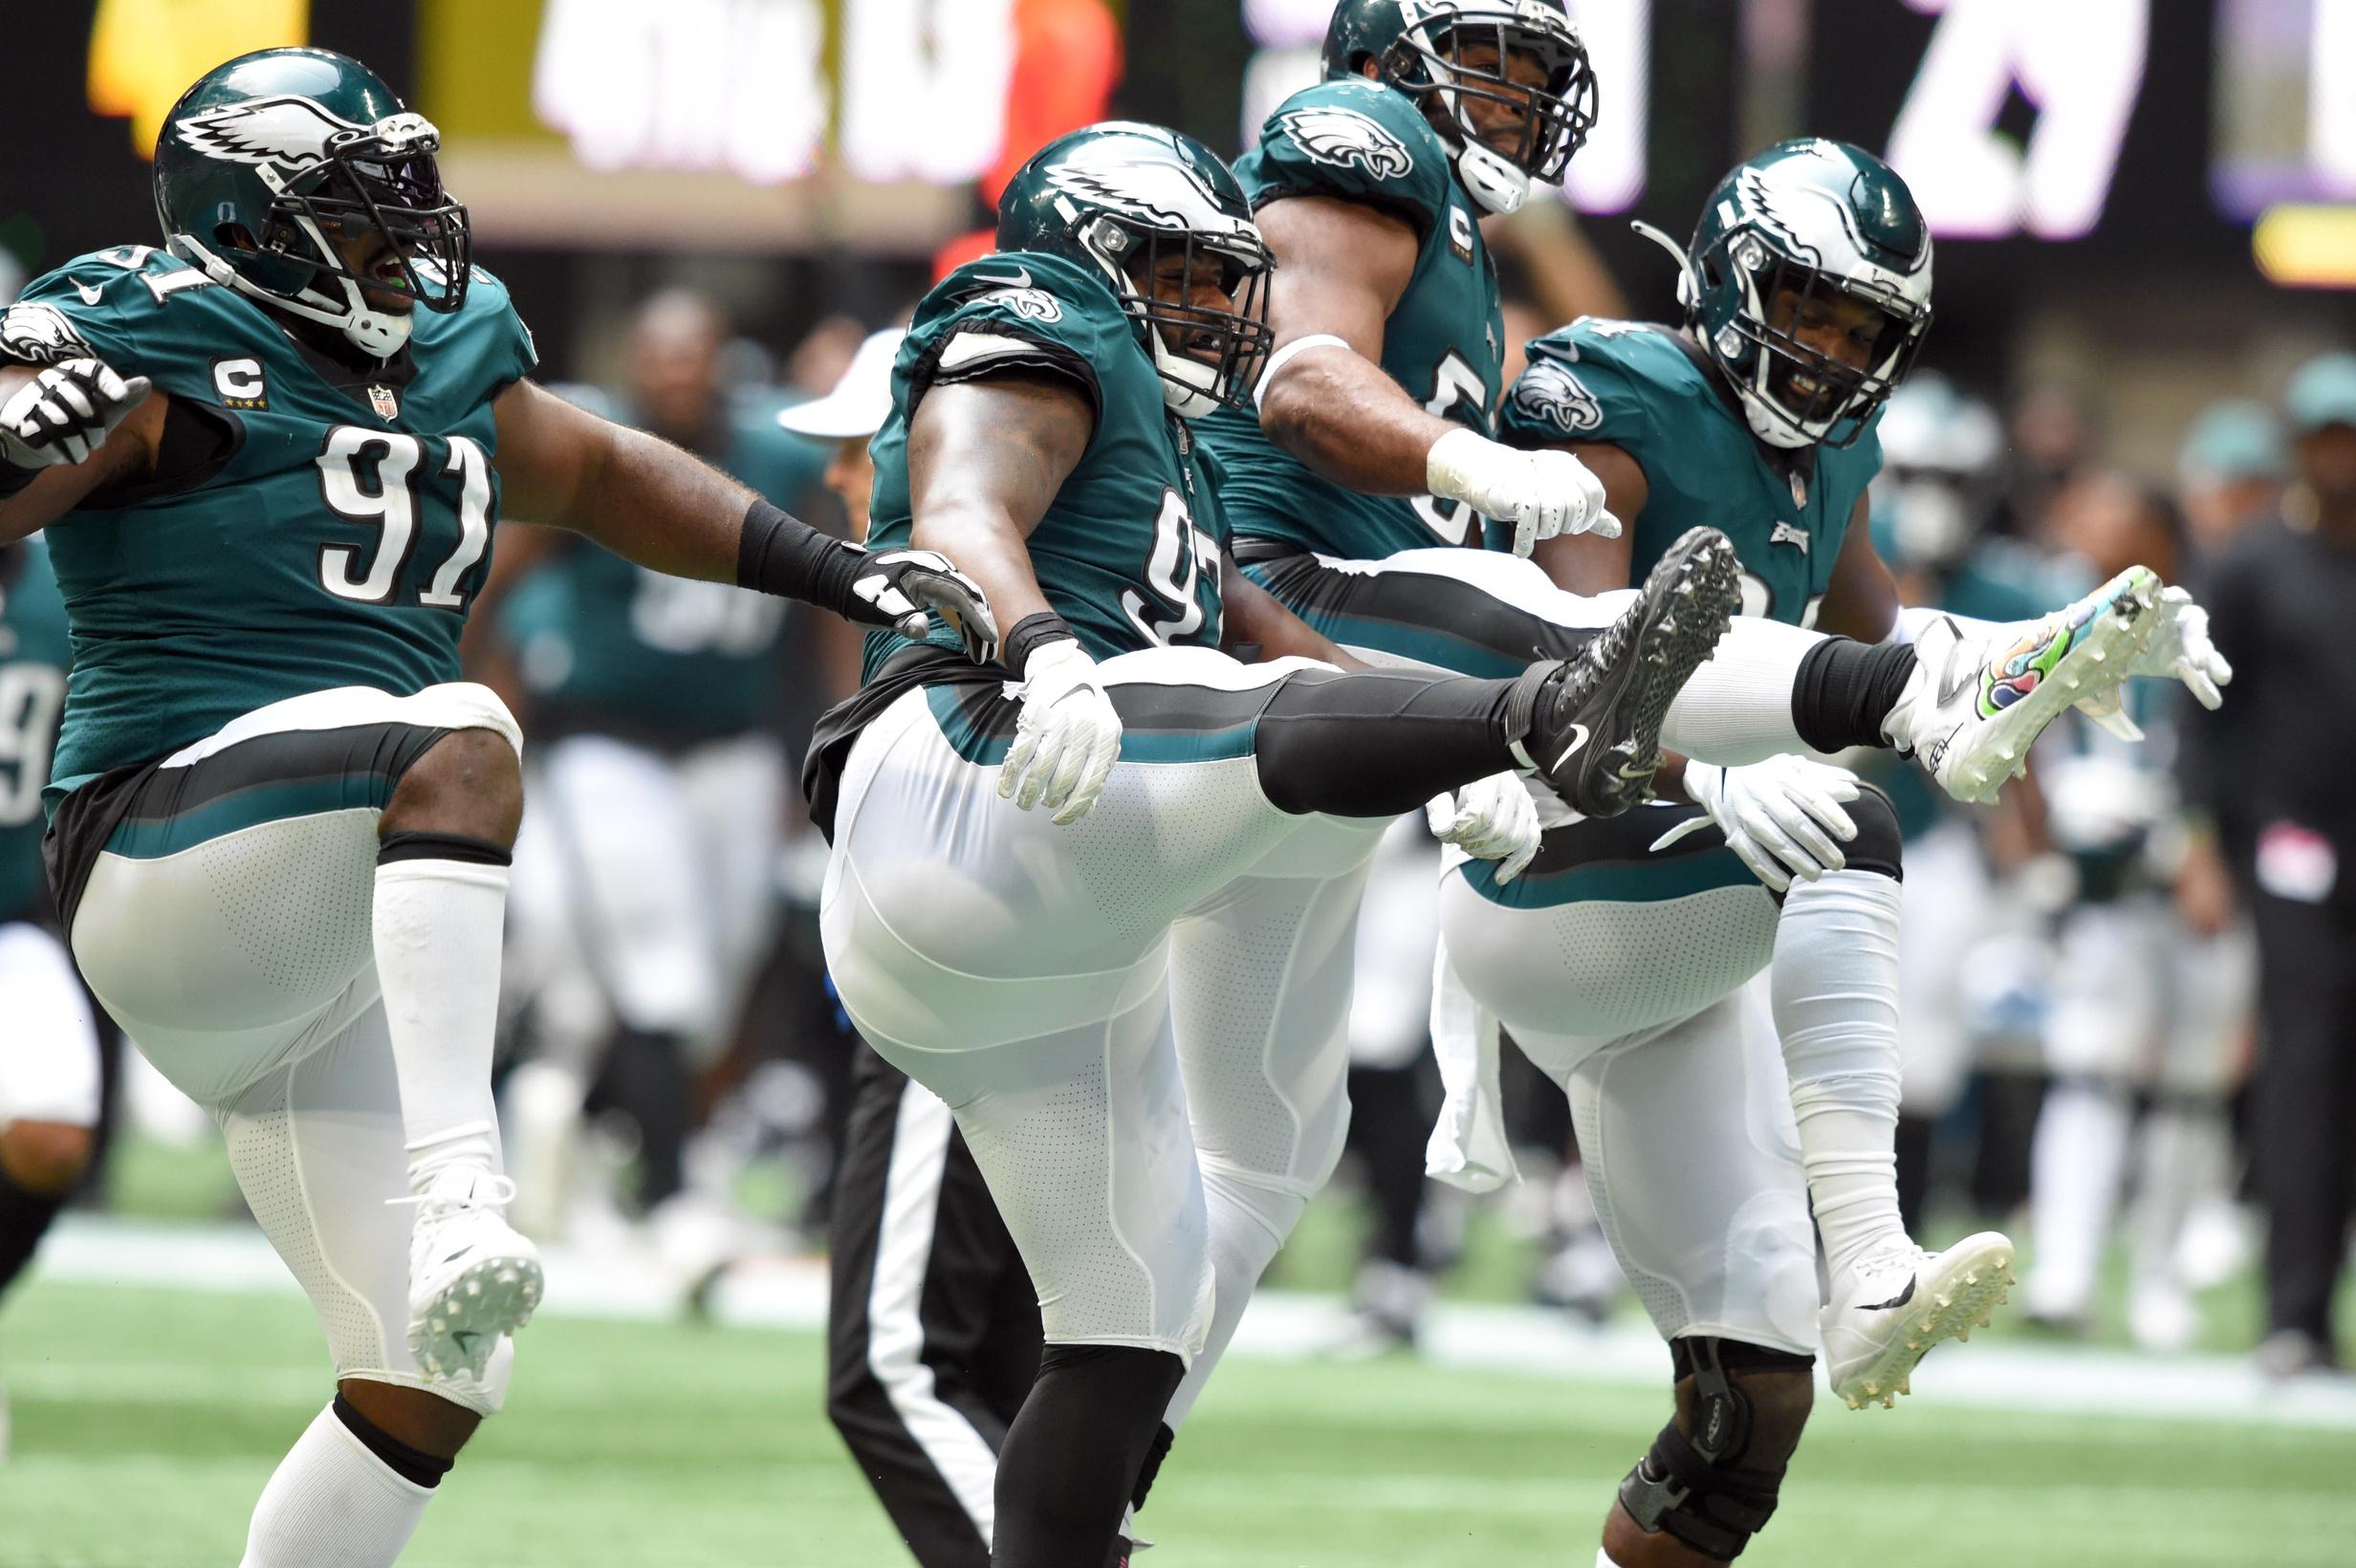 Javon-Hargrave-Eagles-defense-Falcons.0.jpg